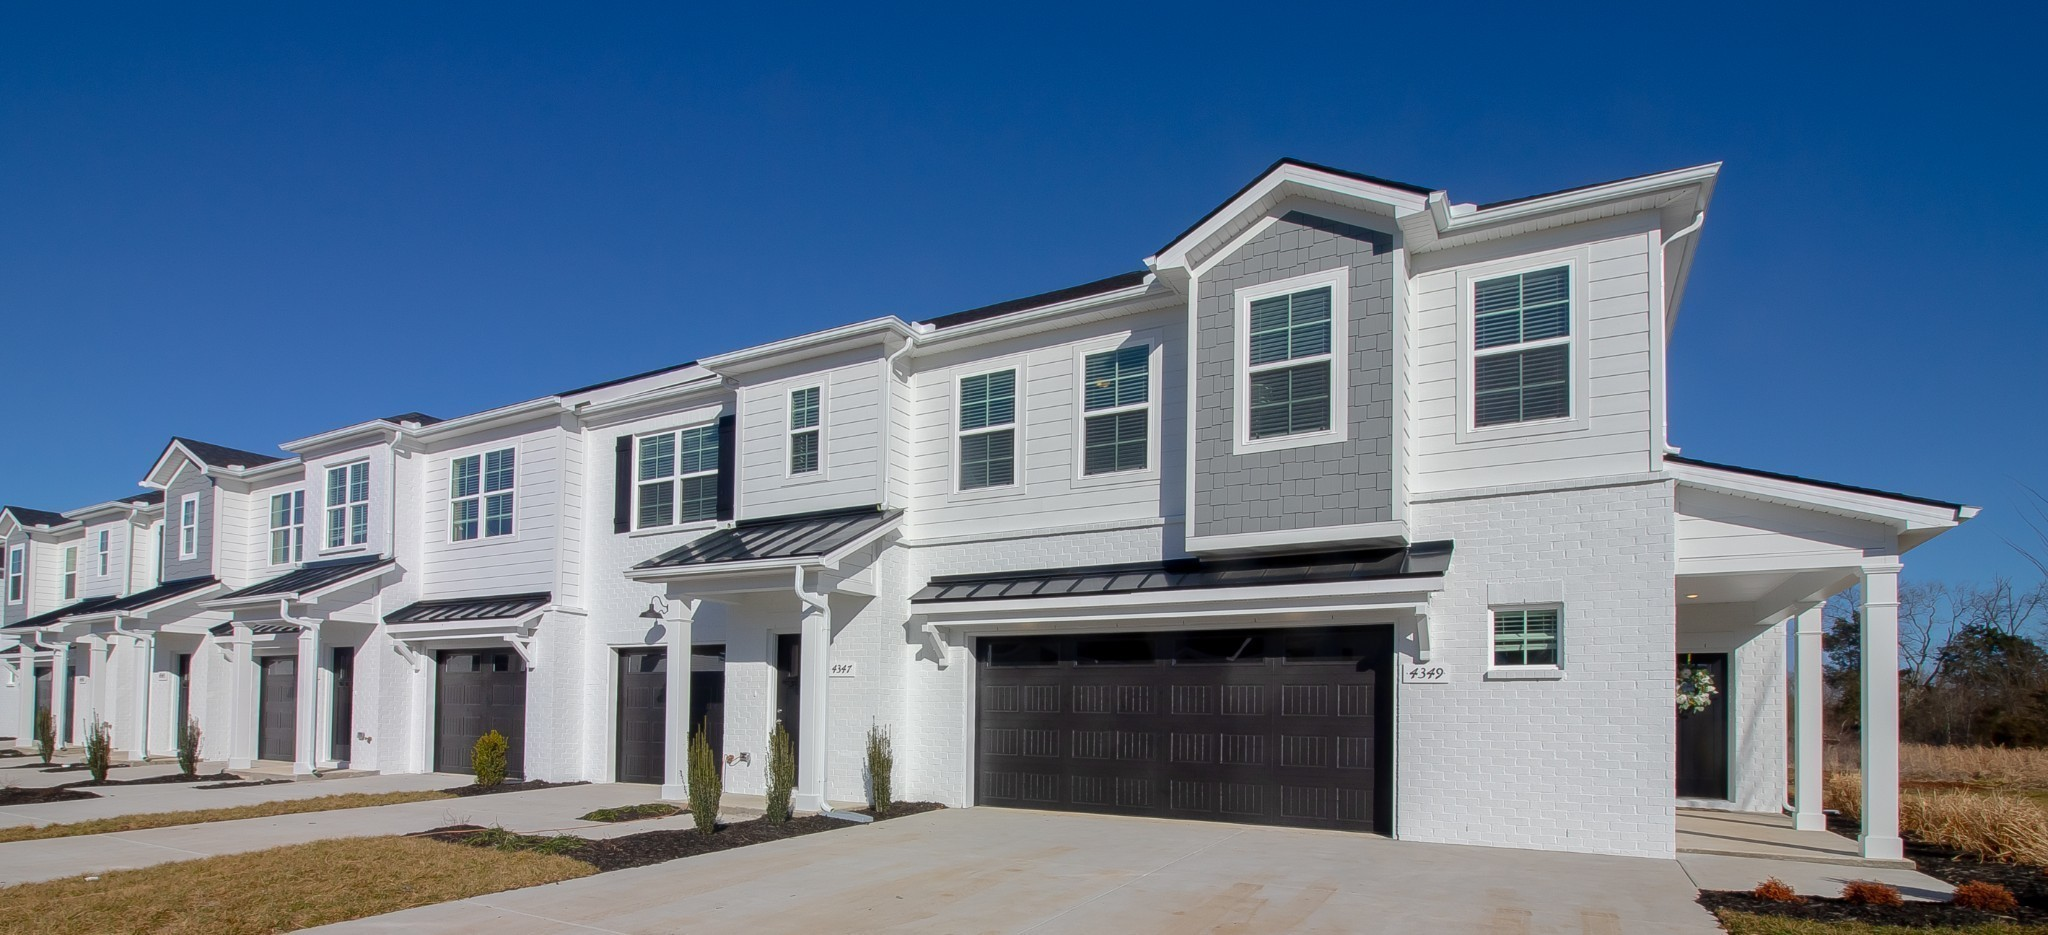 4203 Sarazen Lane Property Photo - Murfreesboro, TN real estate listing